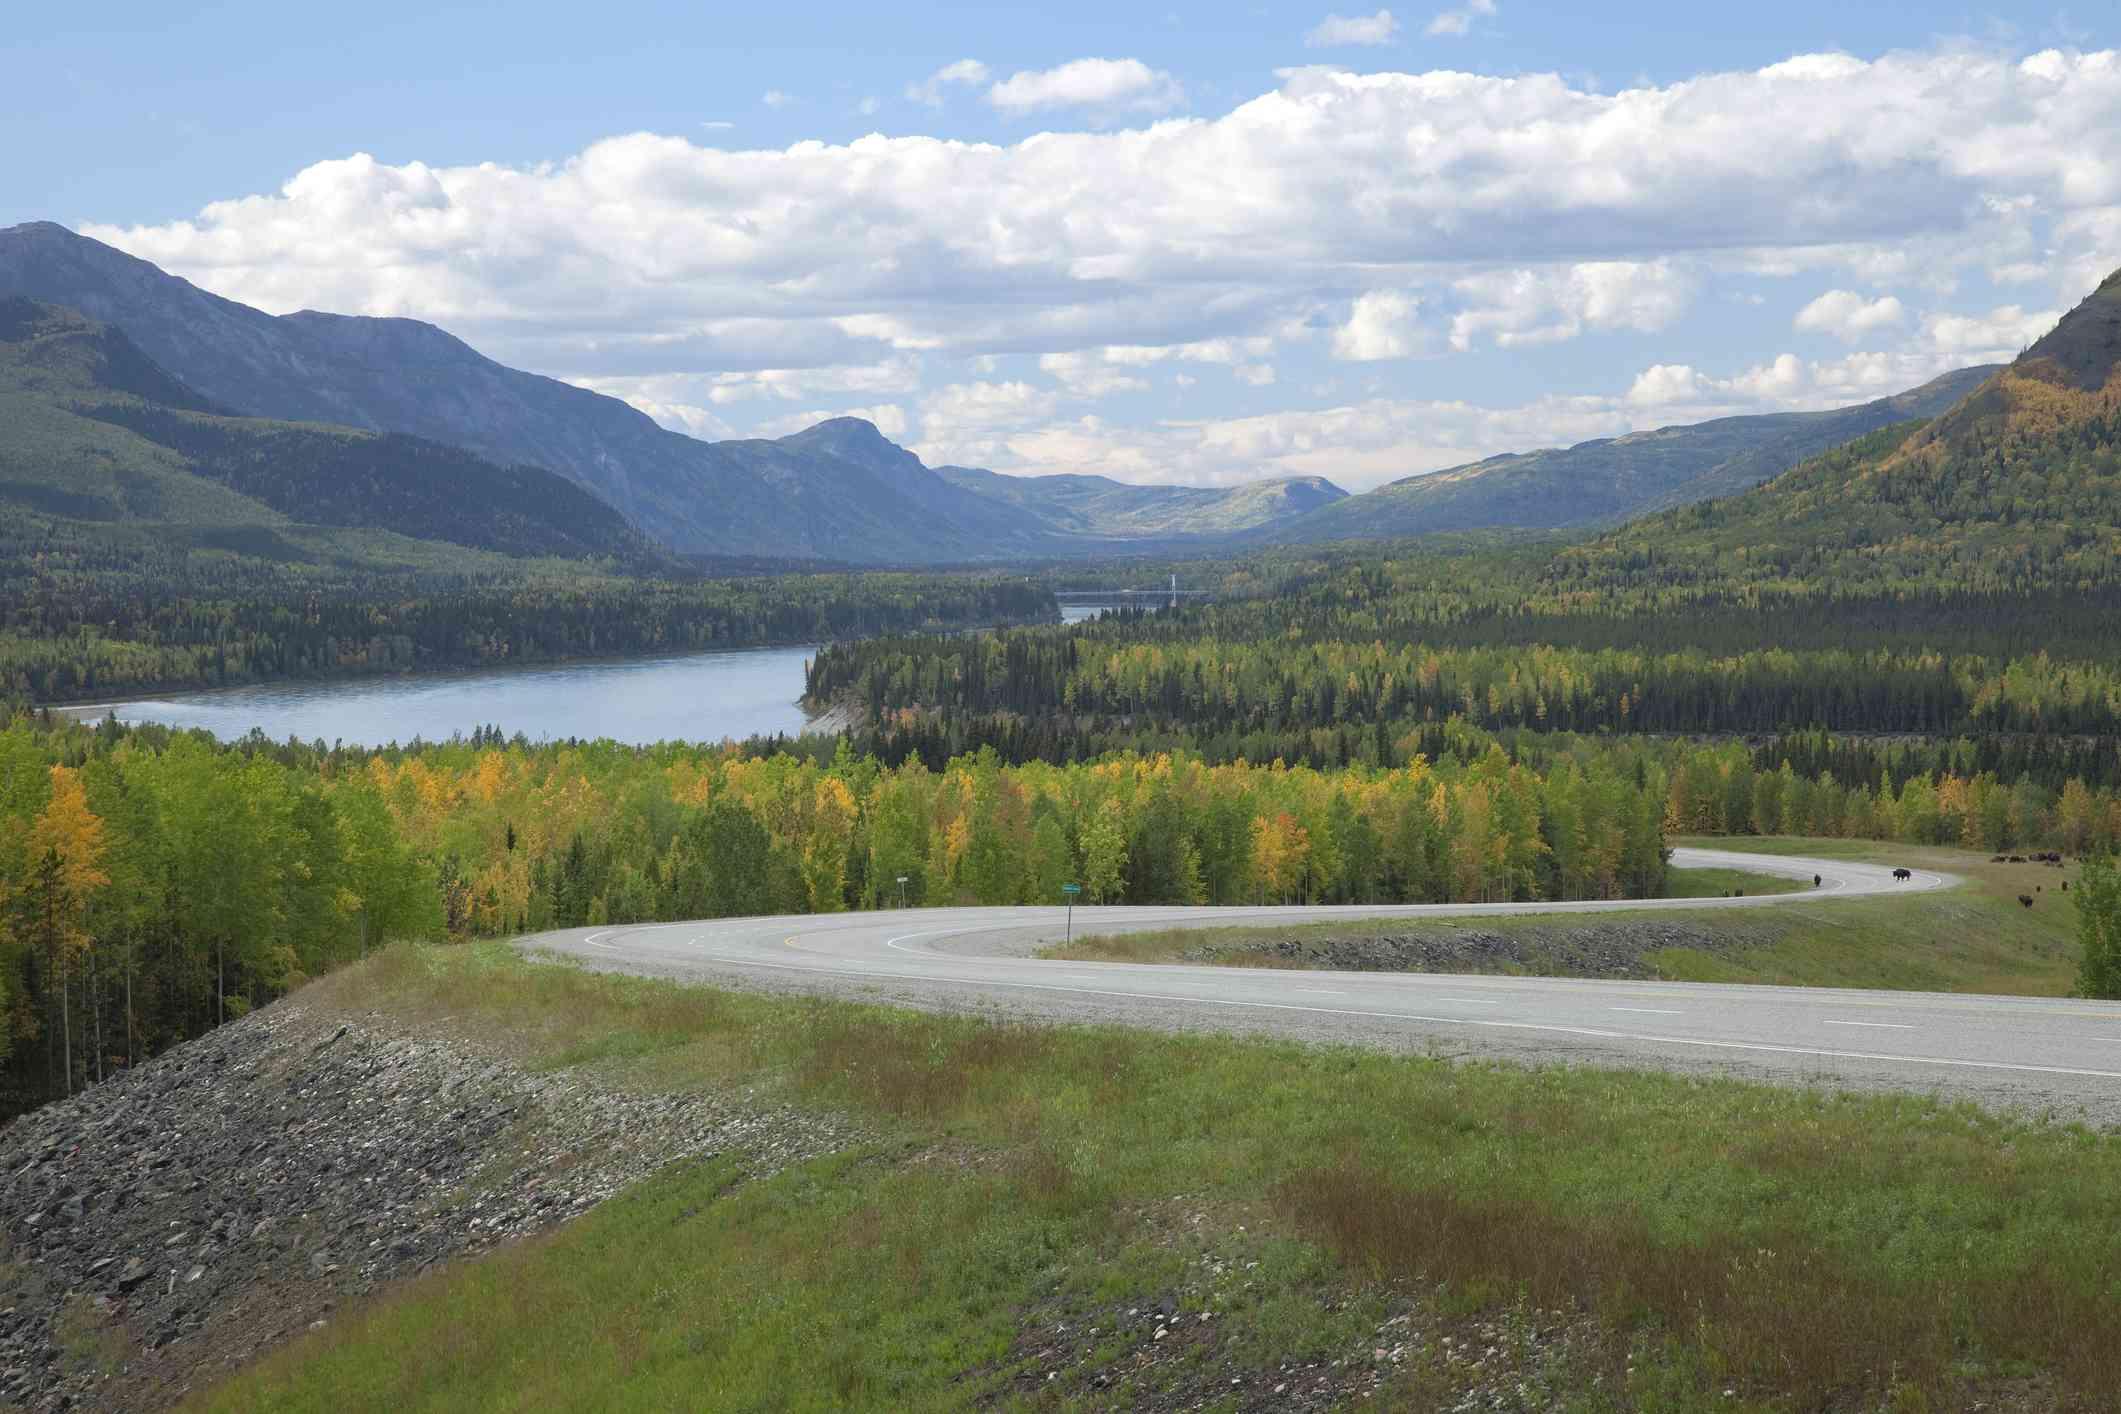 The Alaskan Highway at the Liard River, British Columbia